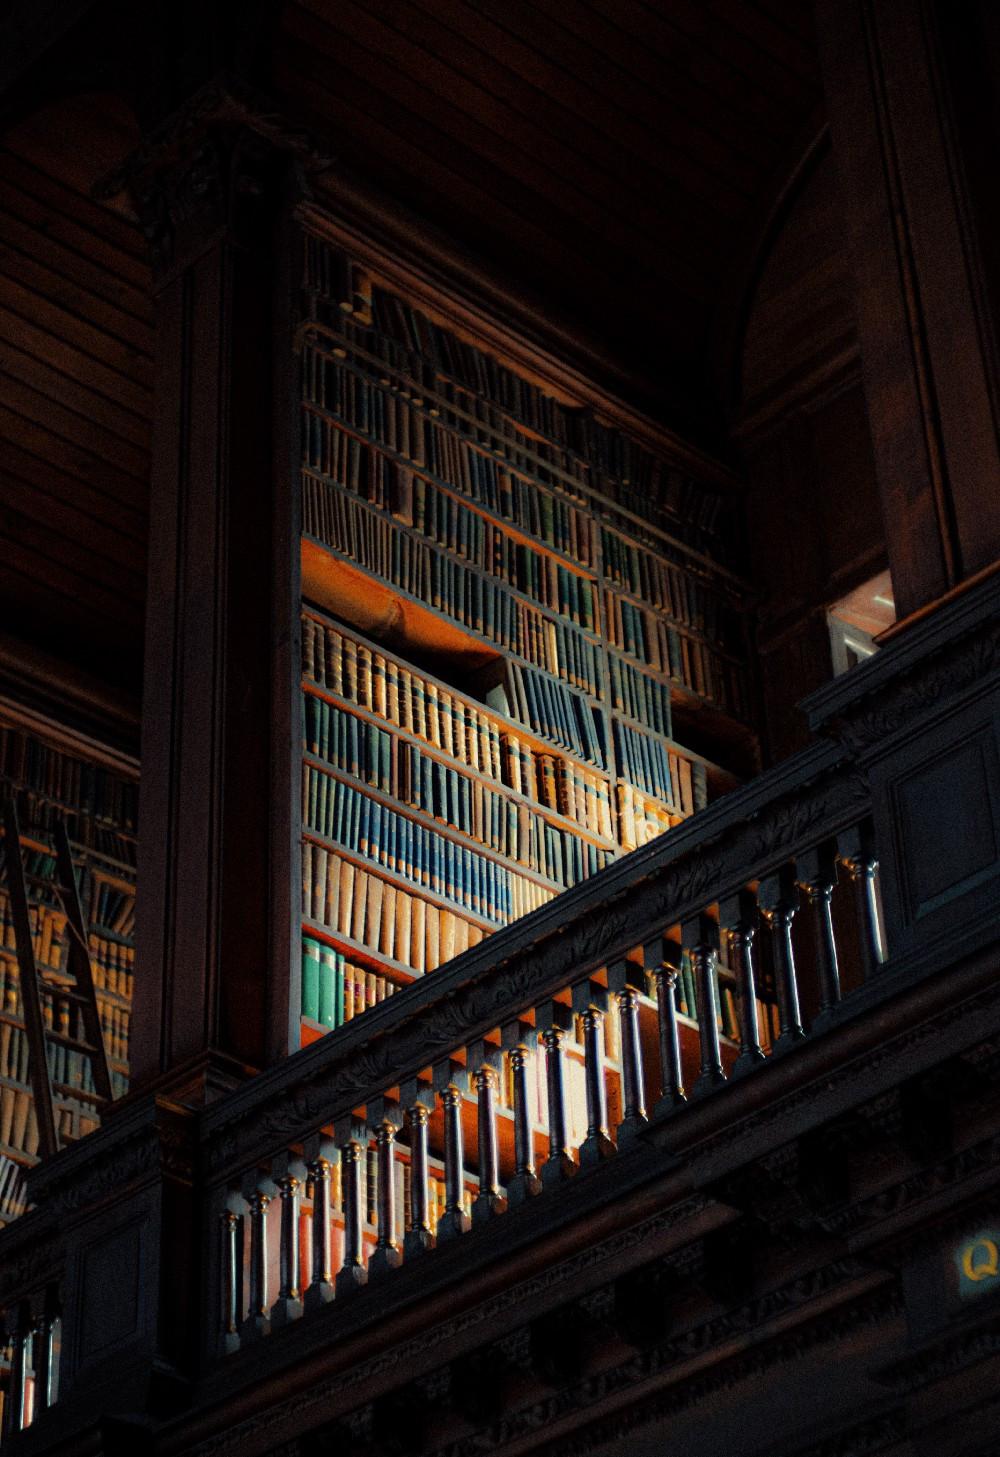 library shelves in the dark